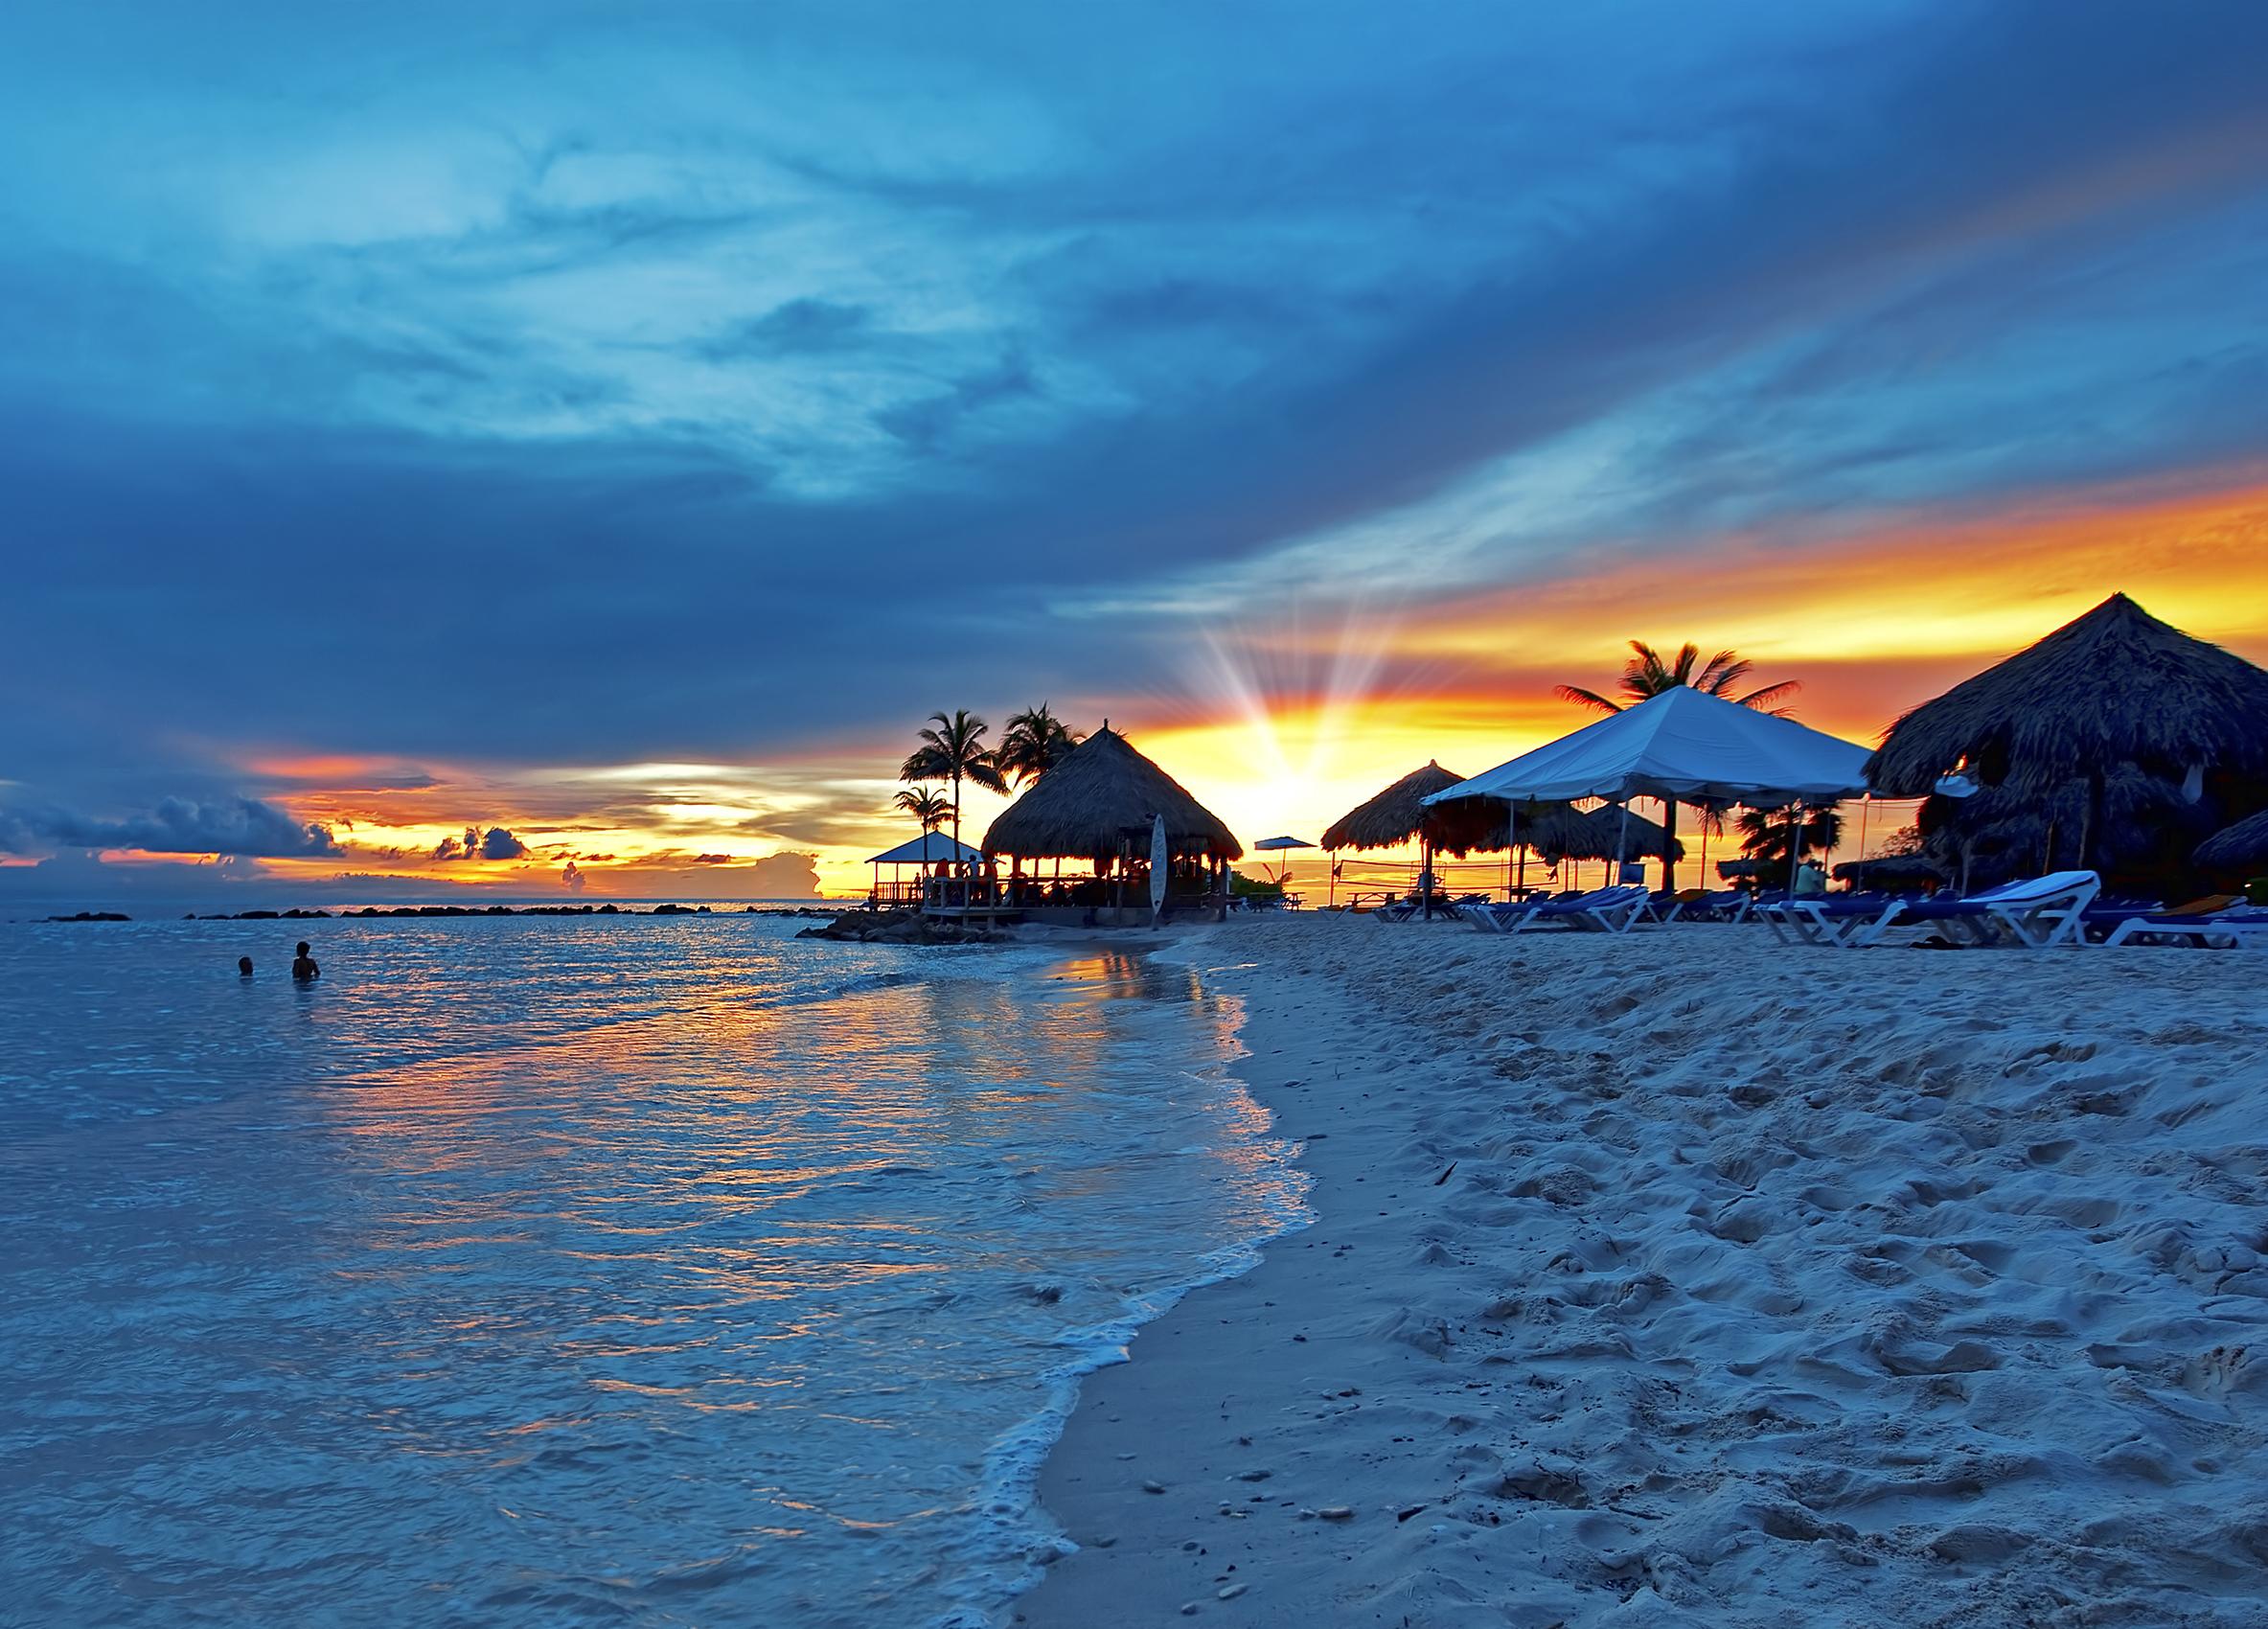 curacao_bigstock-Sunset-on-Curacao-10995287_crop.jpg